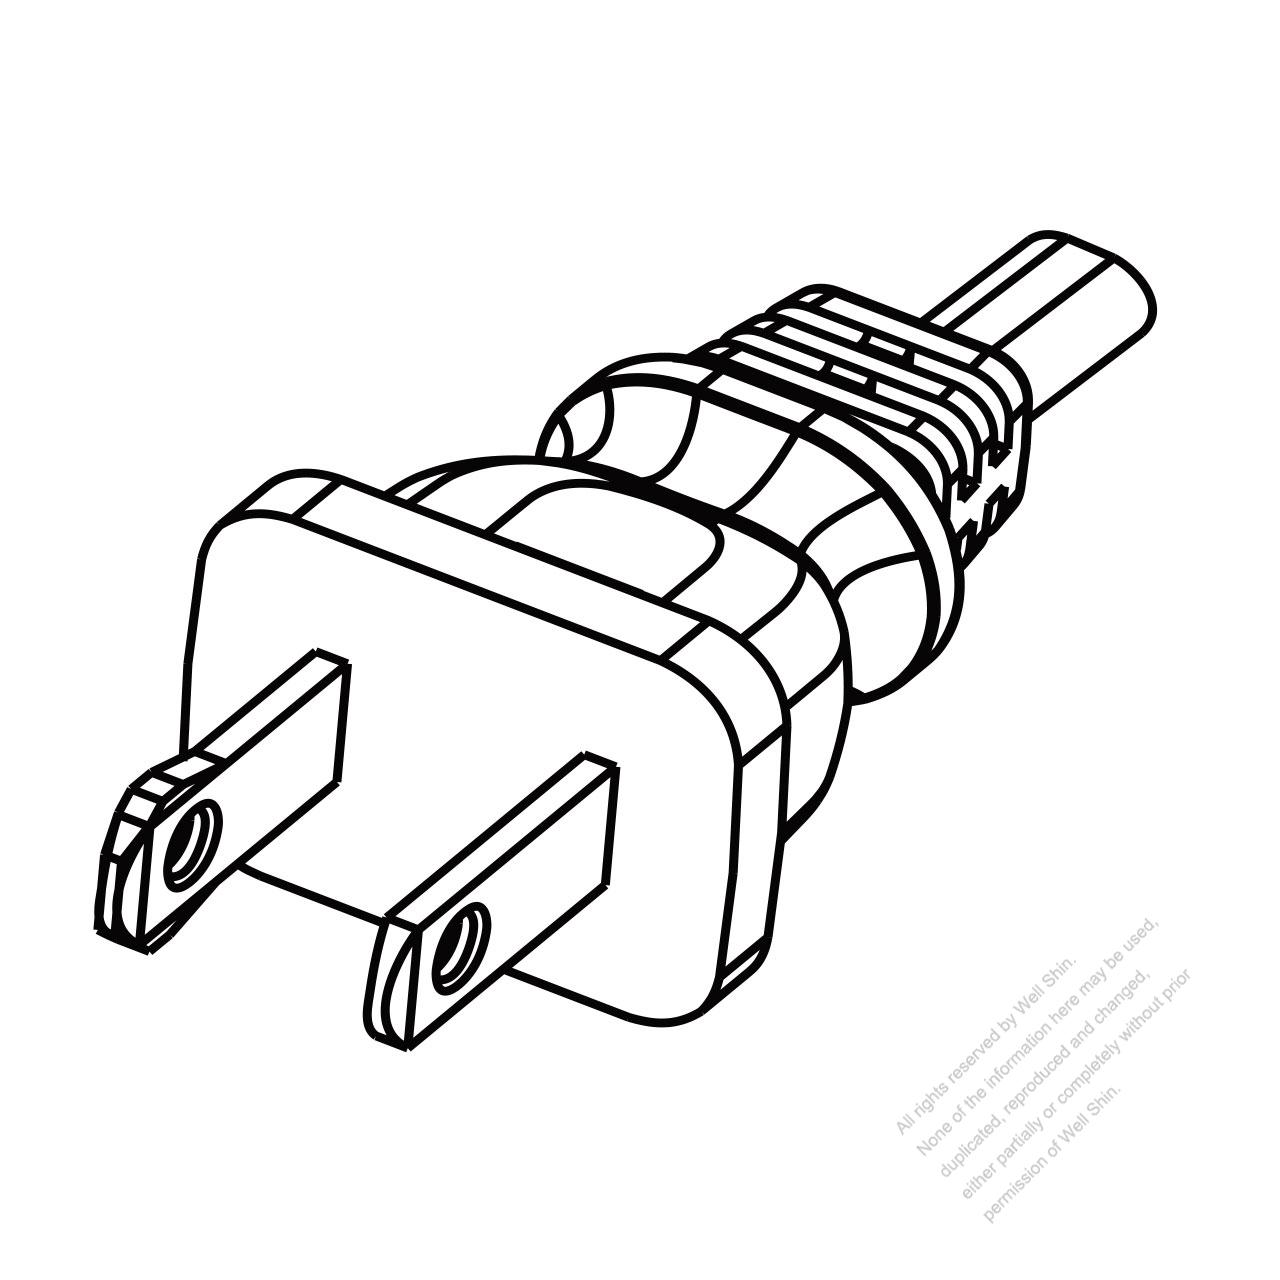 US/Canada 2 Pin NEMA 1-15P Polarized Plug/ Cable End Remove Outer ...